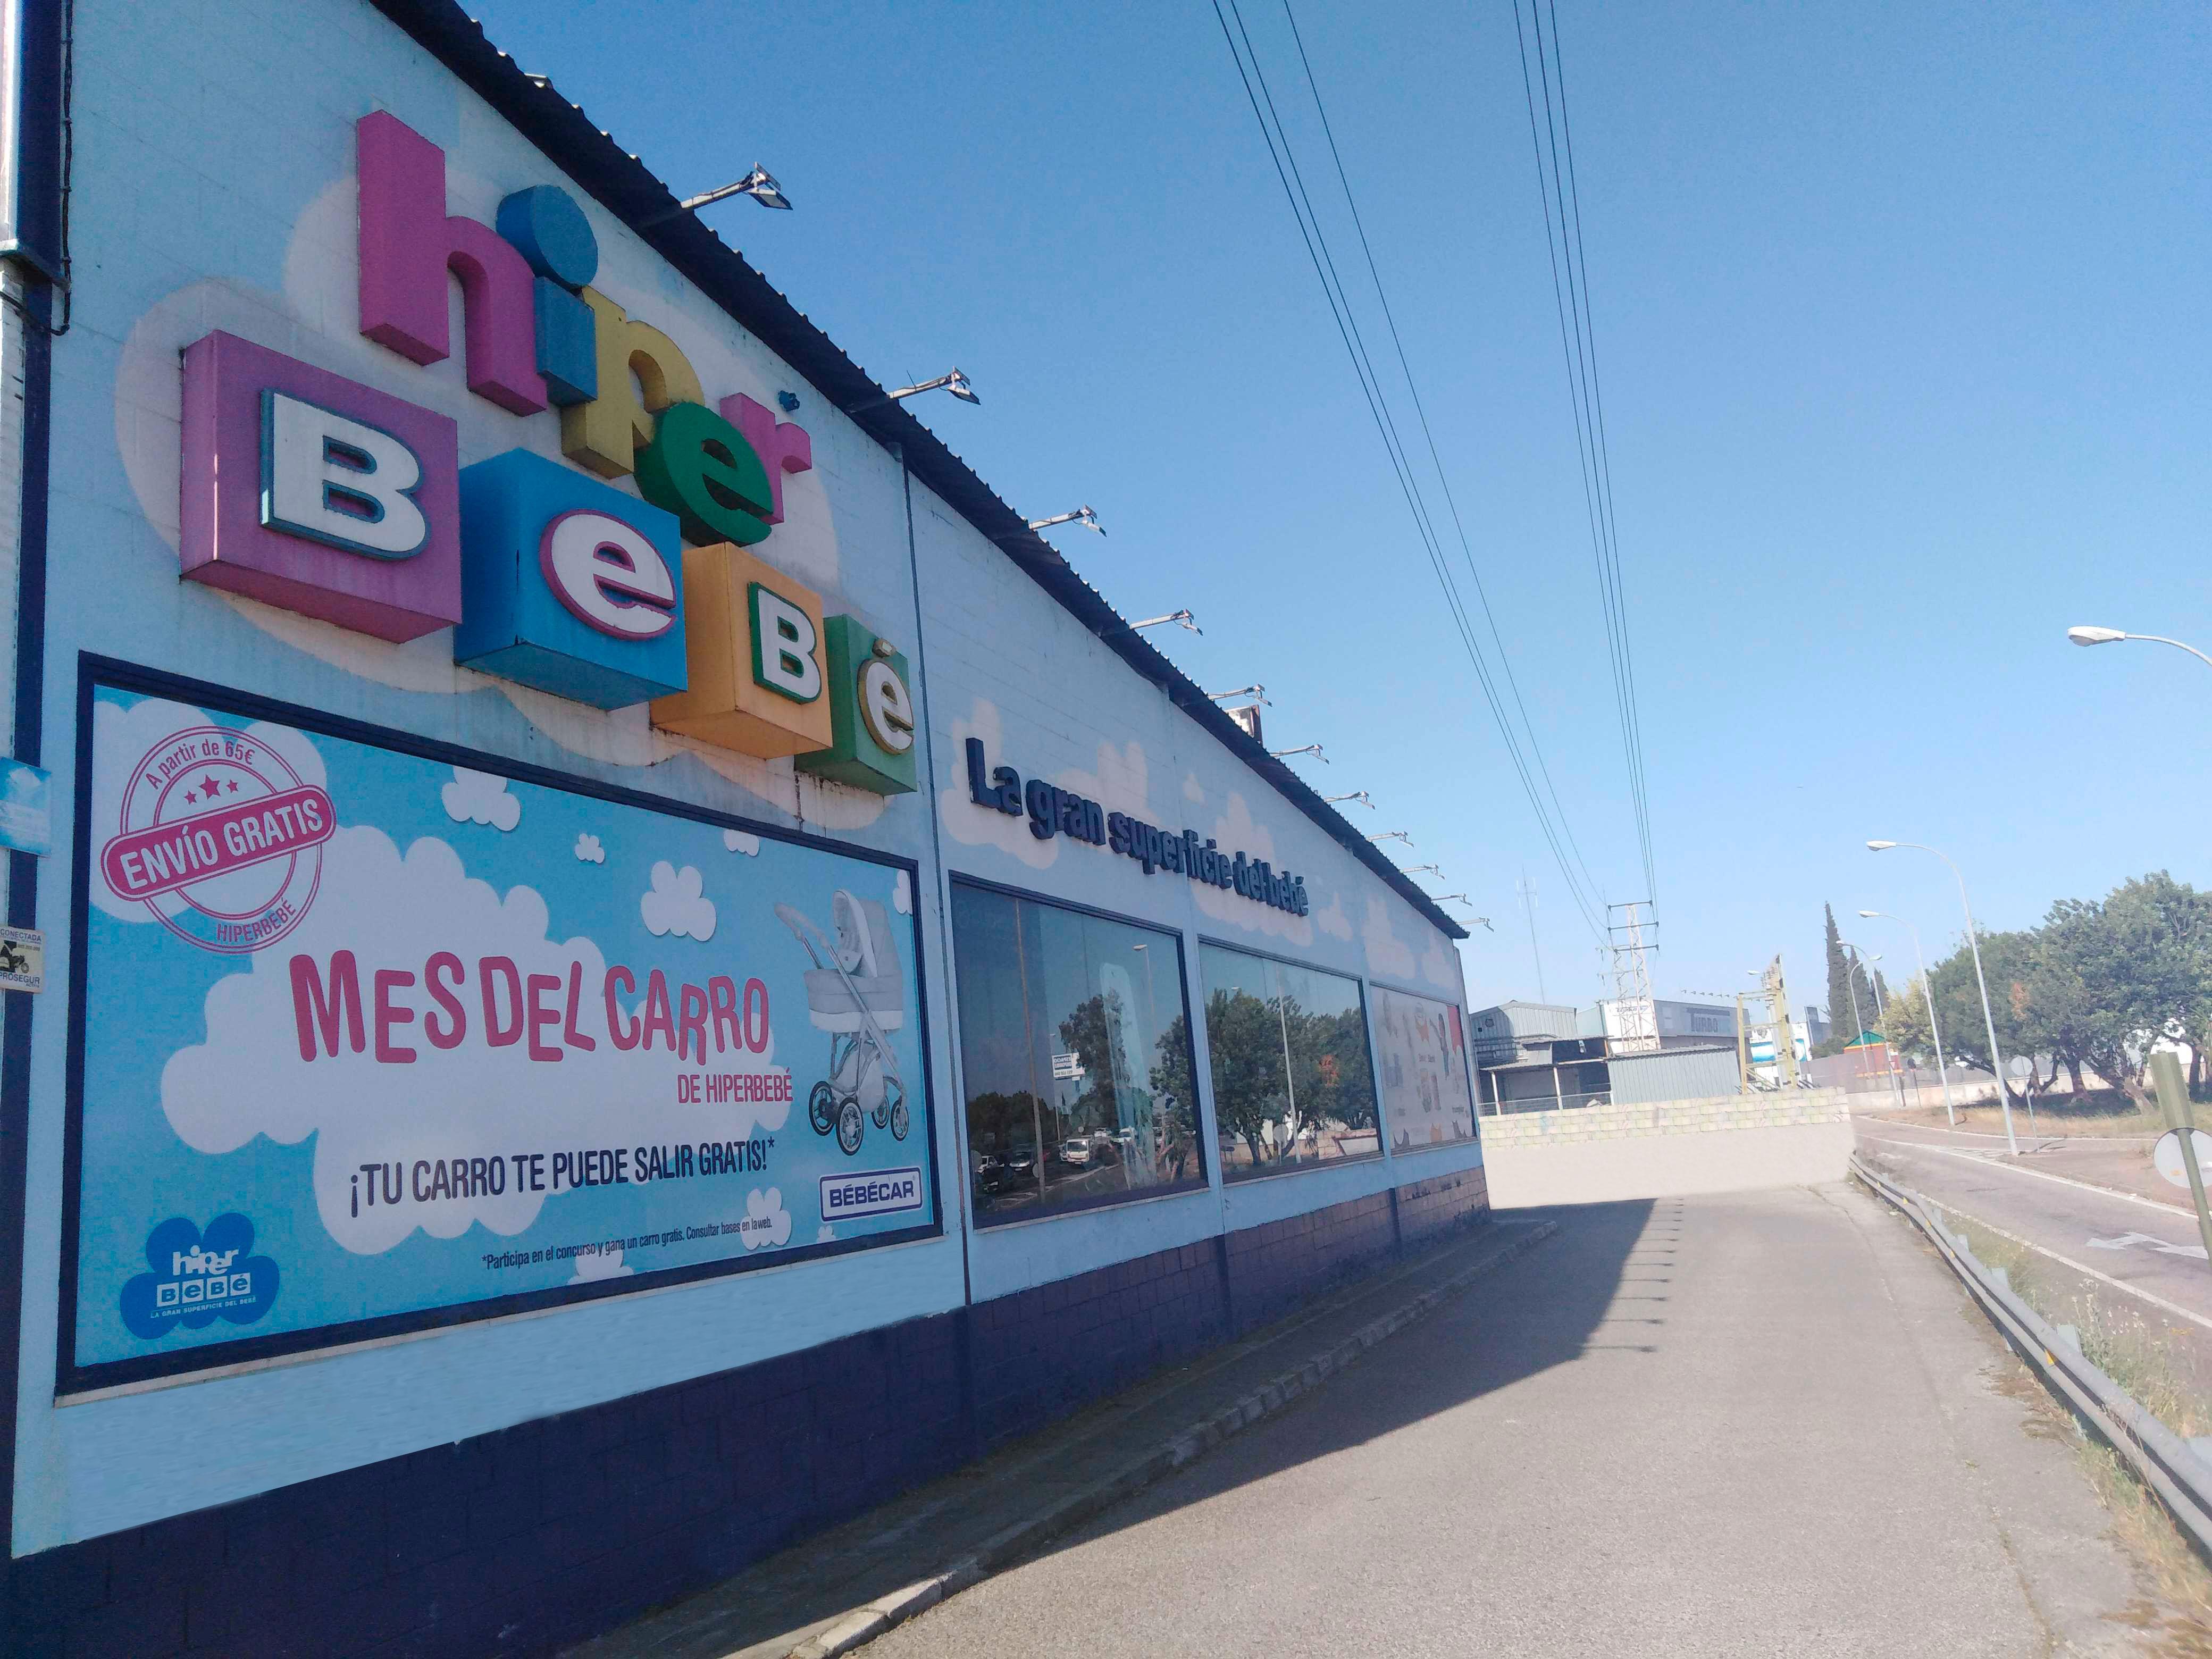 Tienda bebe Sevilla